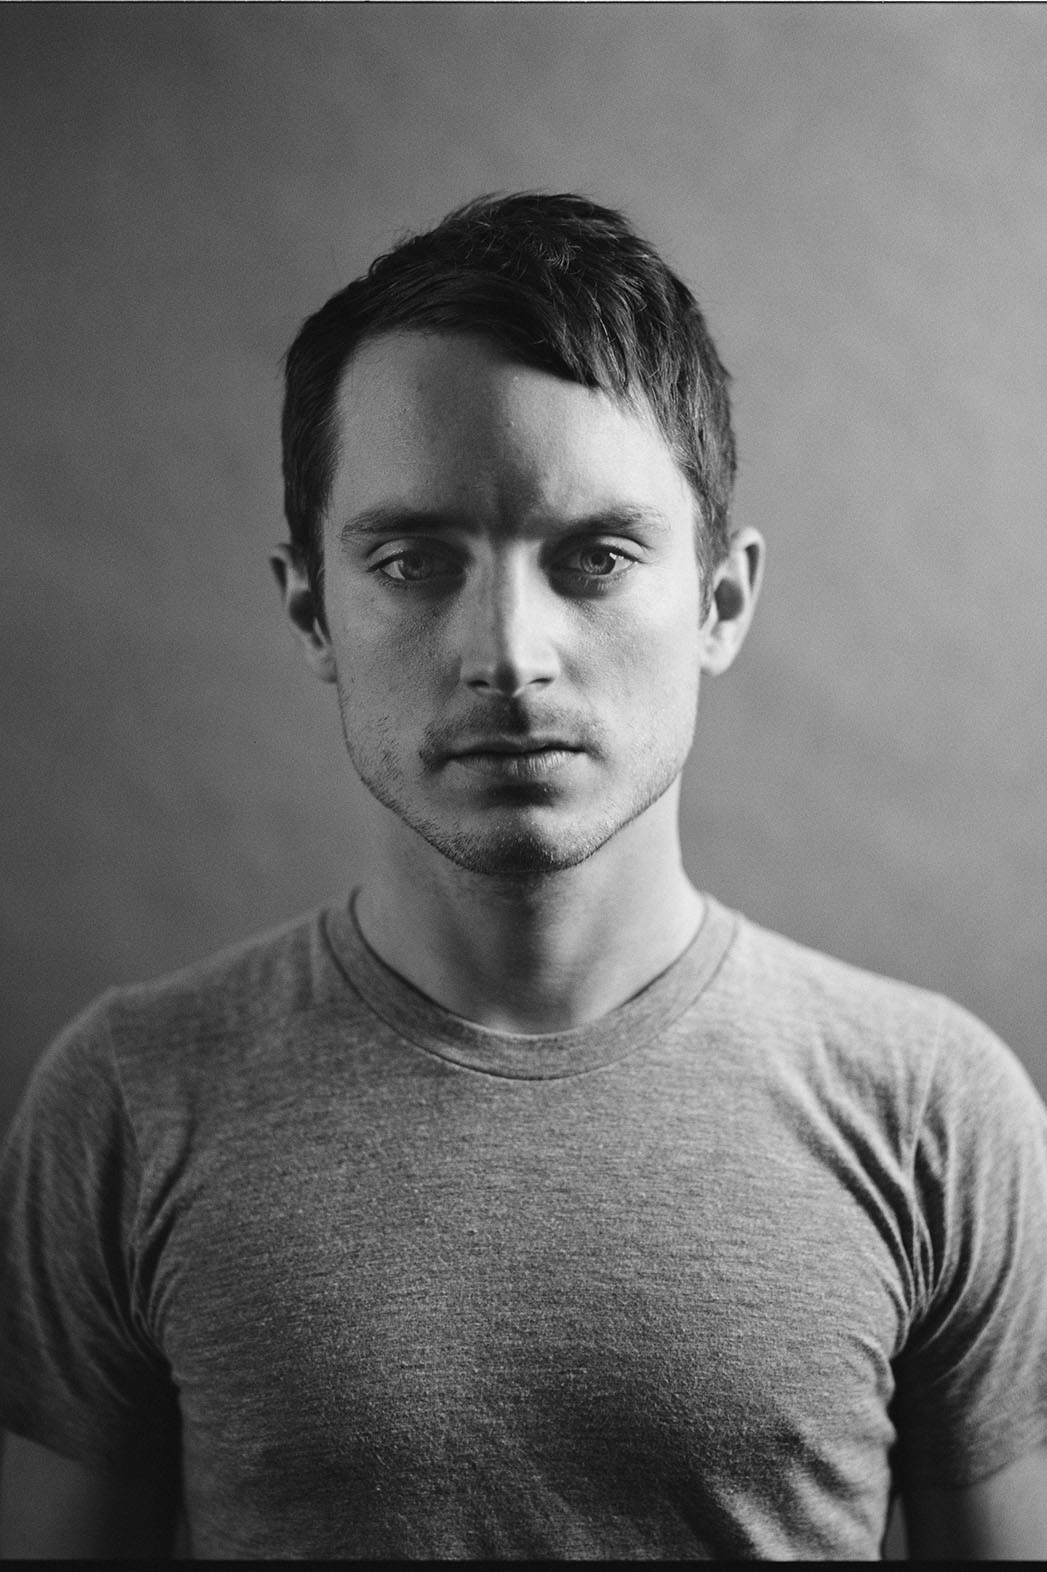 Elijah Wood Headshot - P 2014